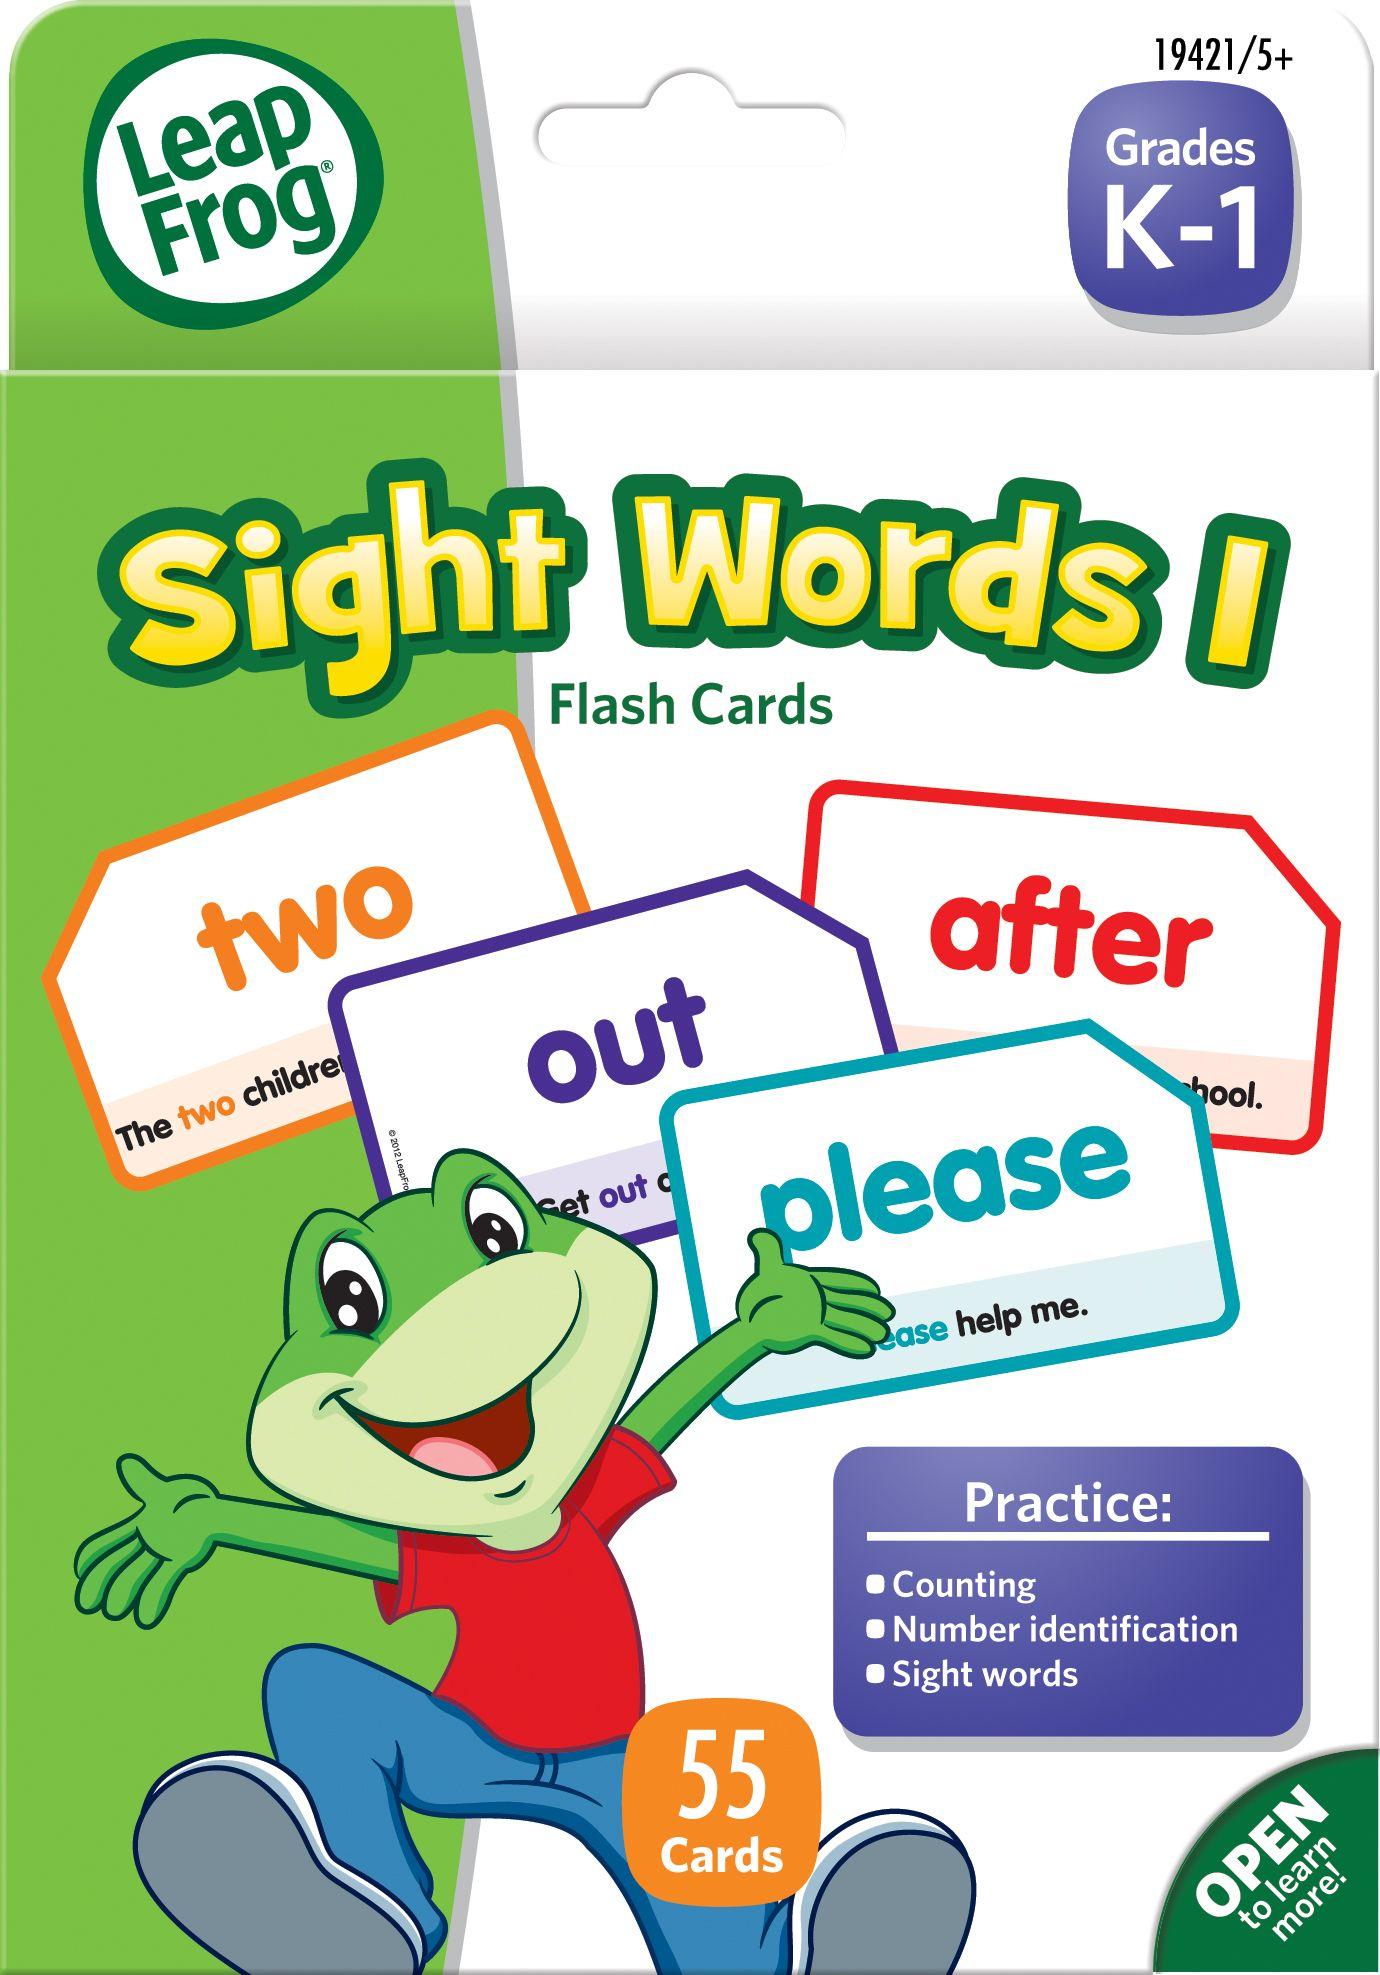 Worksheet Sight Word Cards sight words 1 flash cards roseart jbs licensing work pinterest